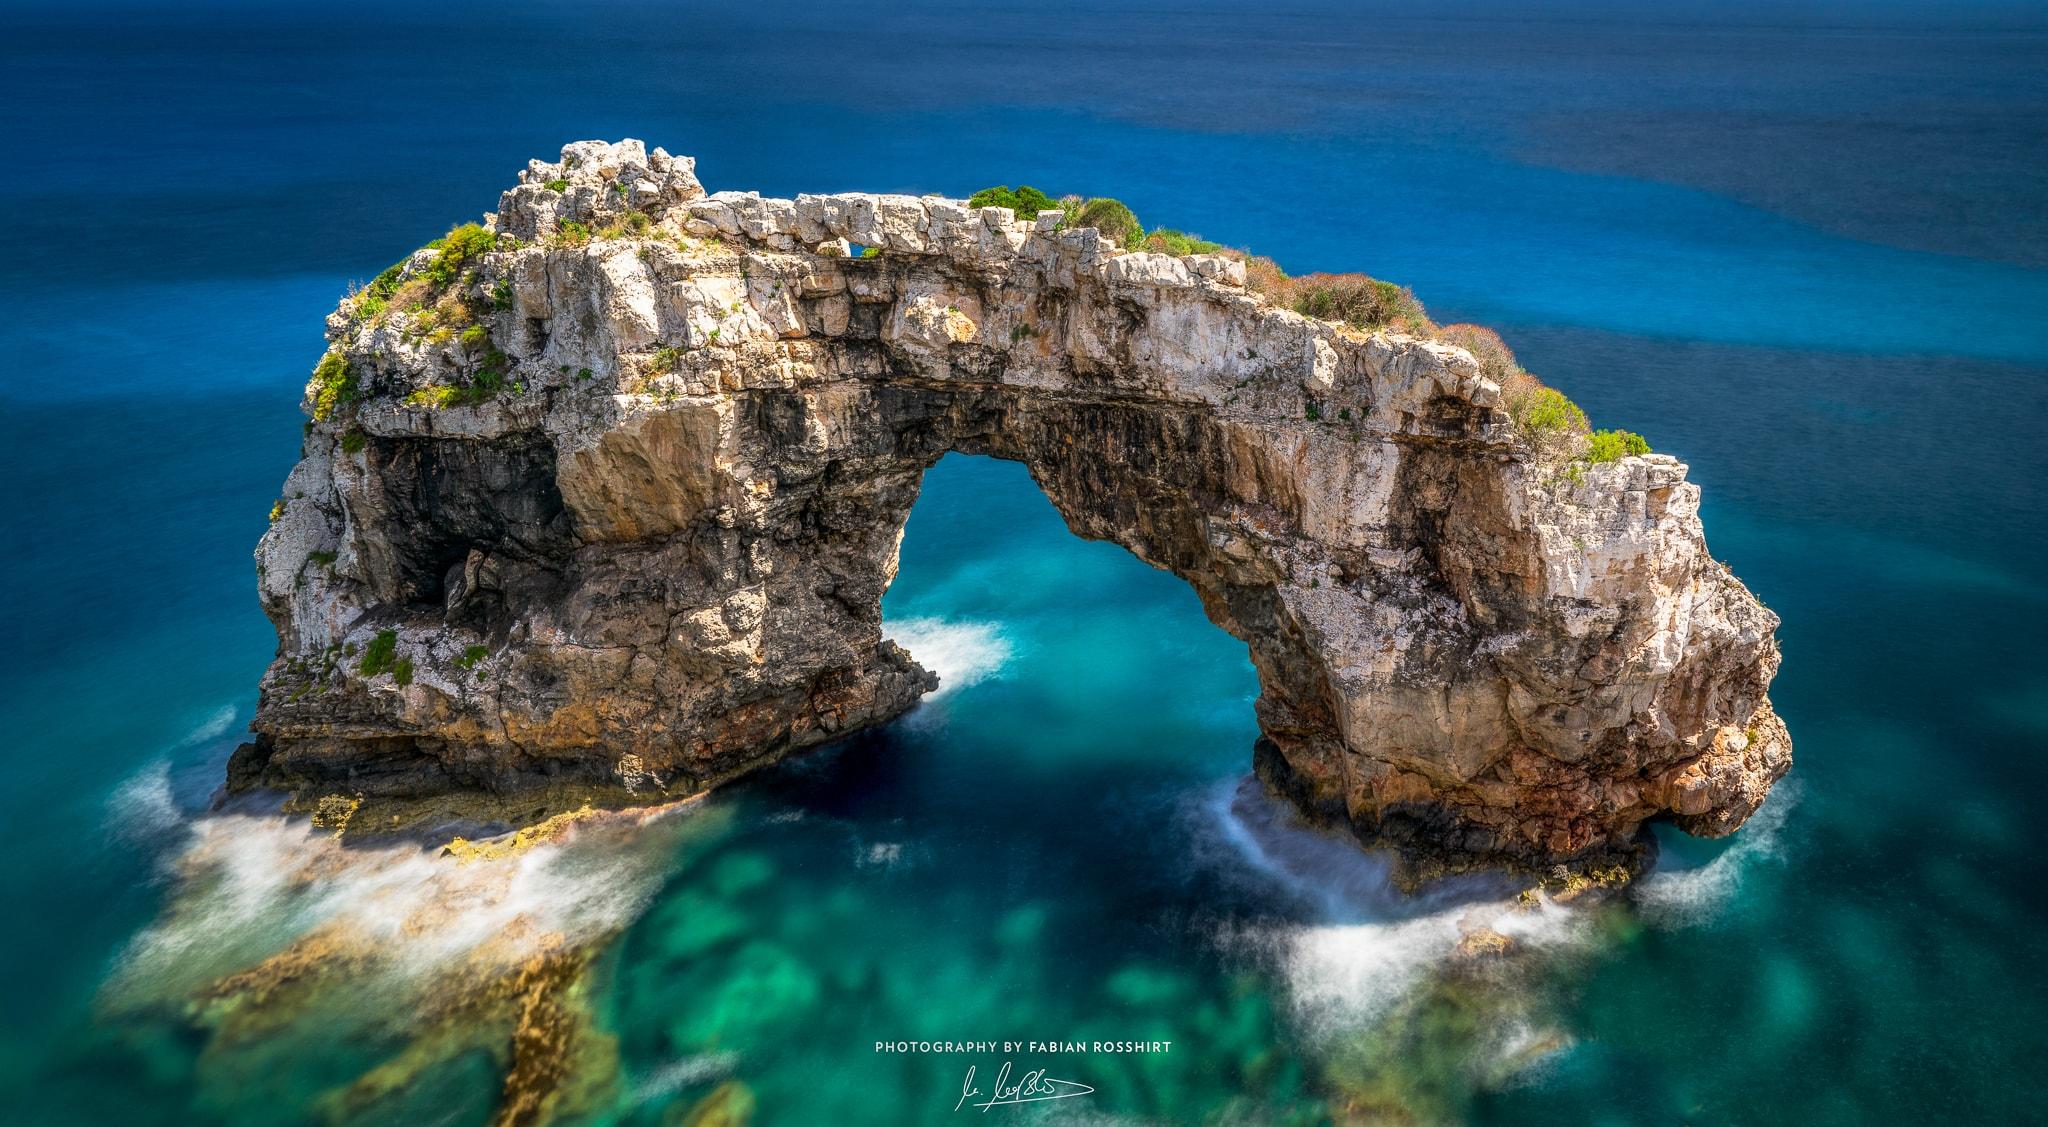 Mallorca Spain Wallpaper Photography Landscape HD Island 2048x1127